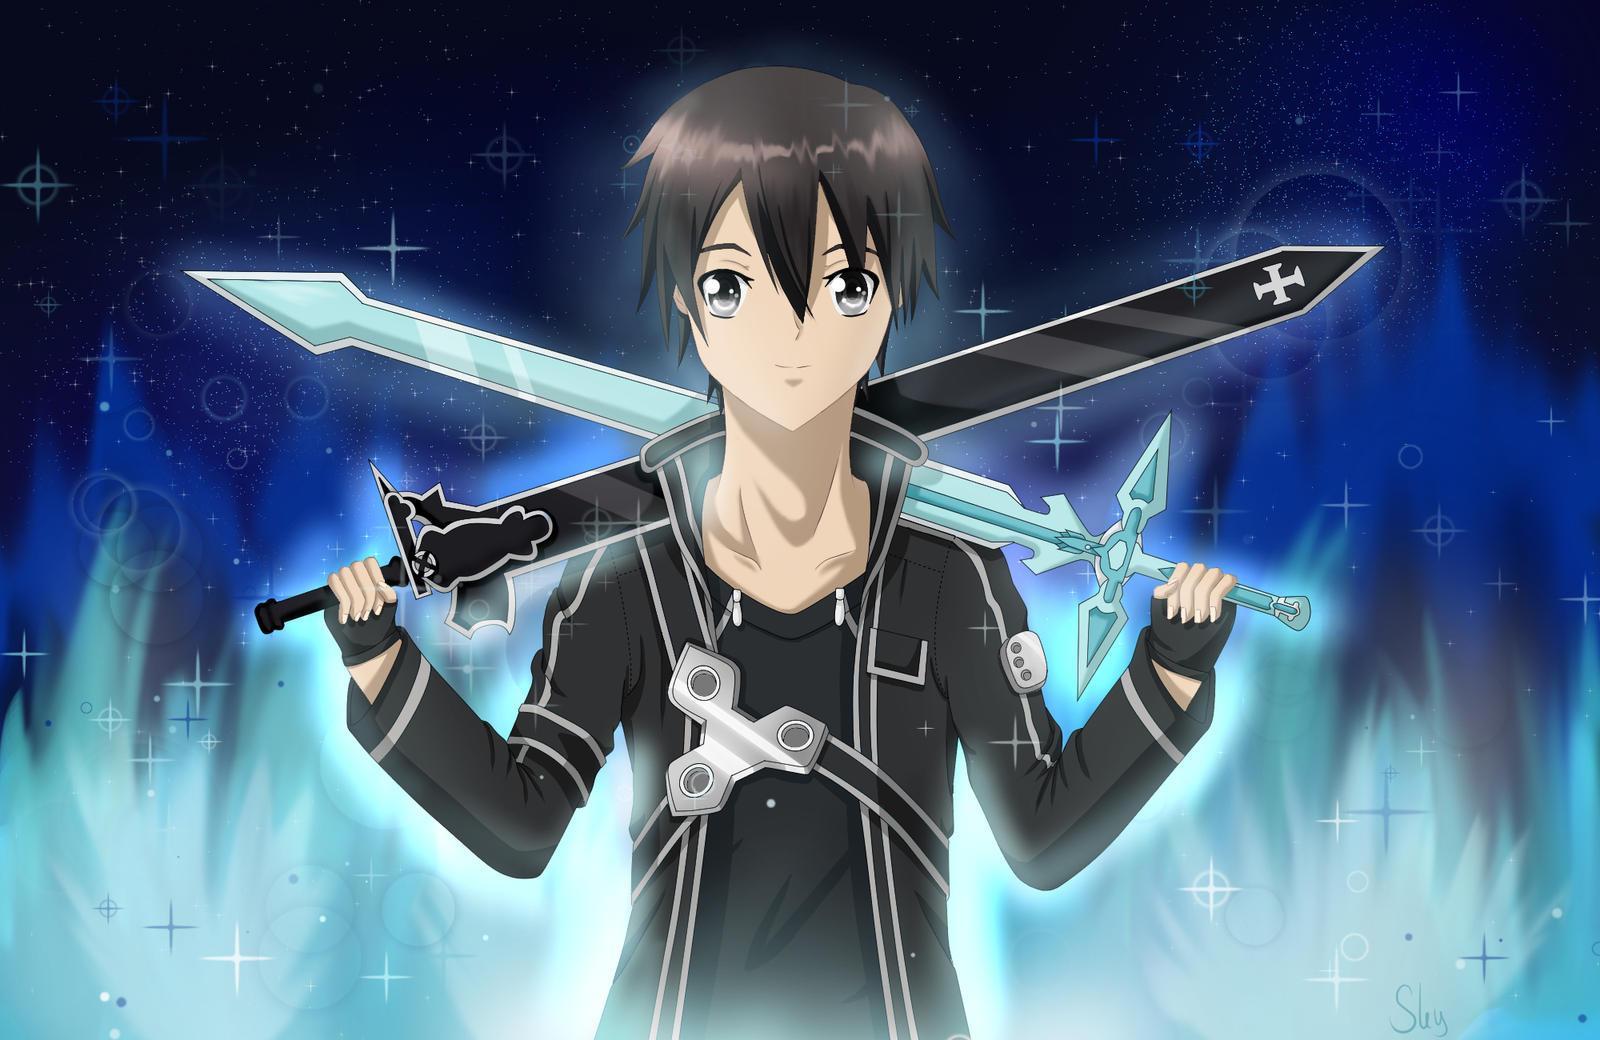 Kirito [Sword Art Online / SAO] By Skyfights On DeviantArt